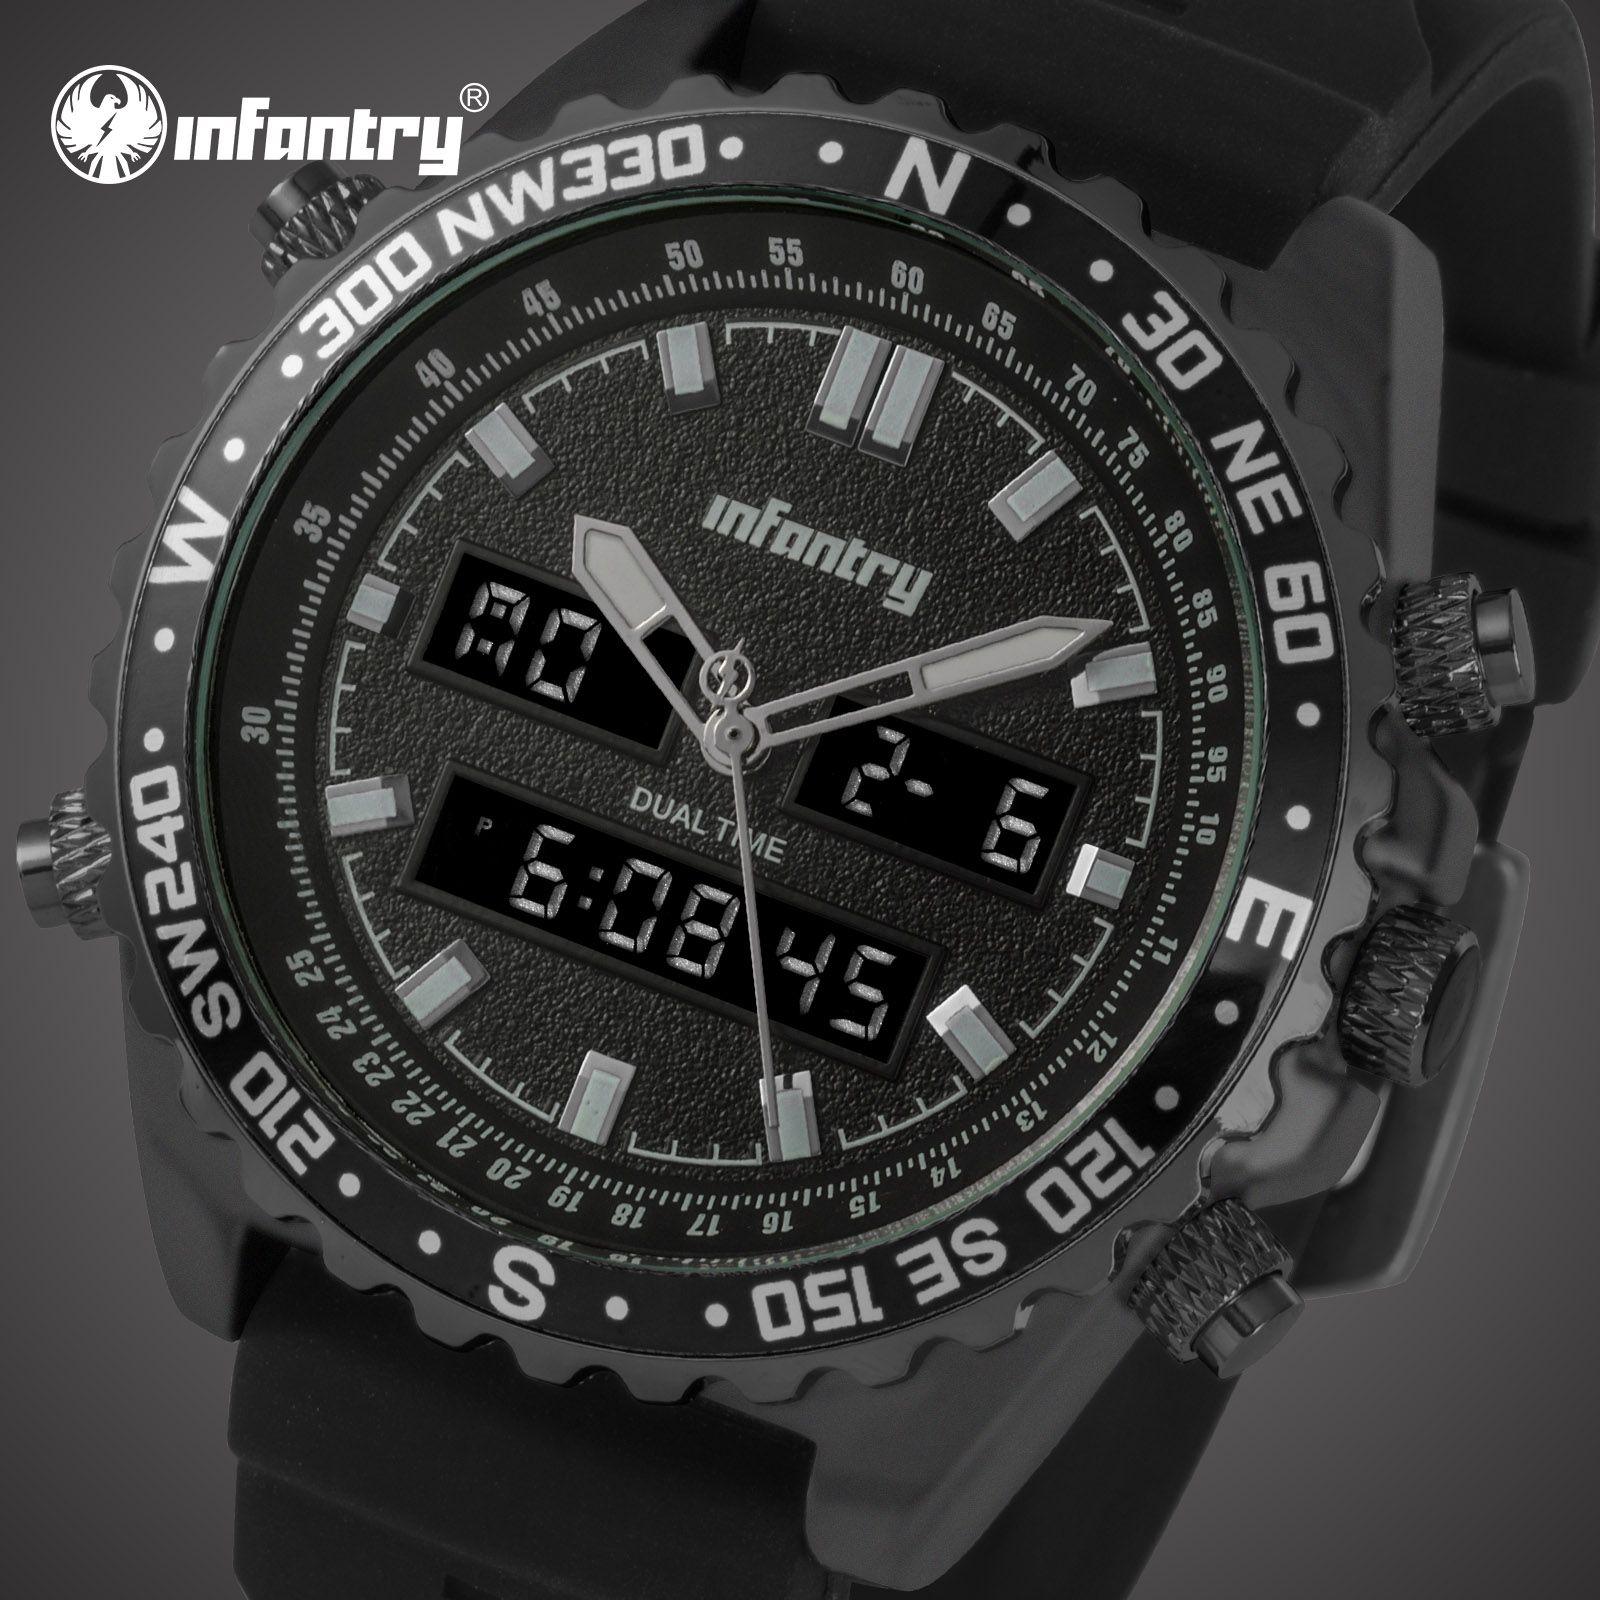 460bfd50b2bb INFANTRY Famous Brand Mens Digital Quartz Wrist Watch Fashion Sport Watches  Military Pilot Army Wristwatch Rubber Strap For Men Montre Homme Wholesale  ...